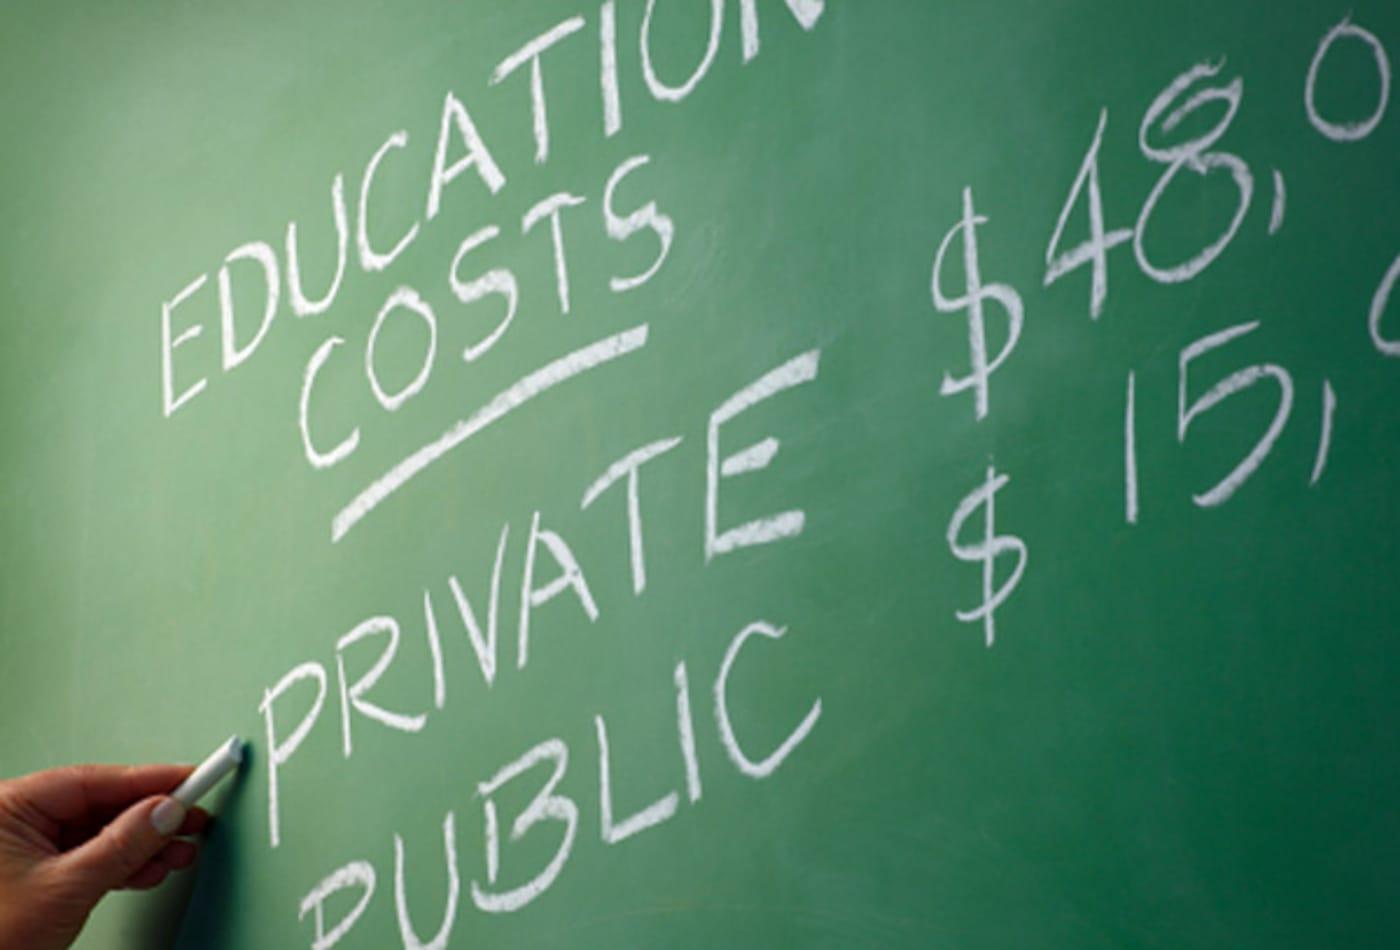 CNBC_Money_back_to_school_spending_K12.jpg